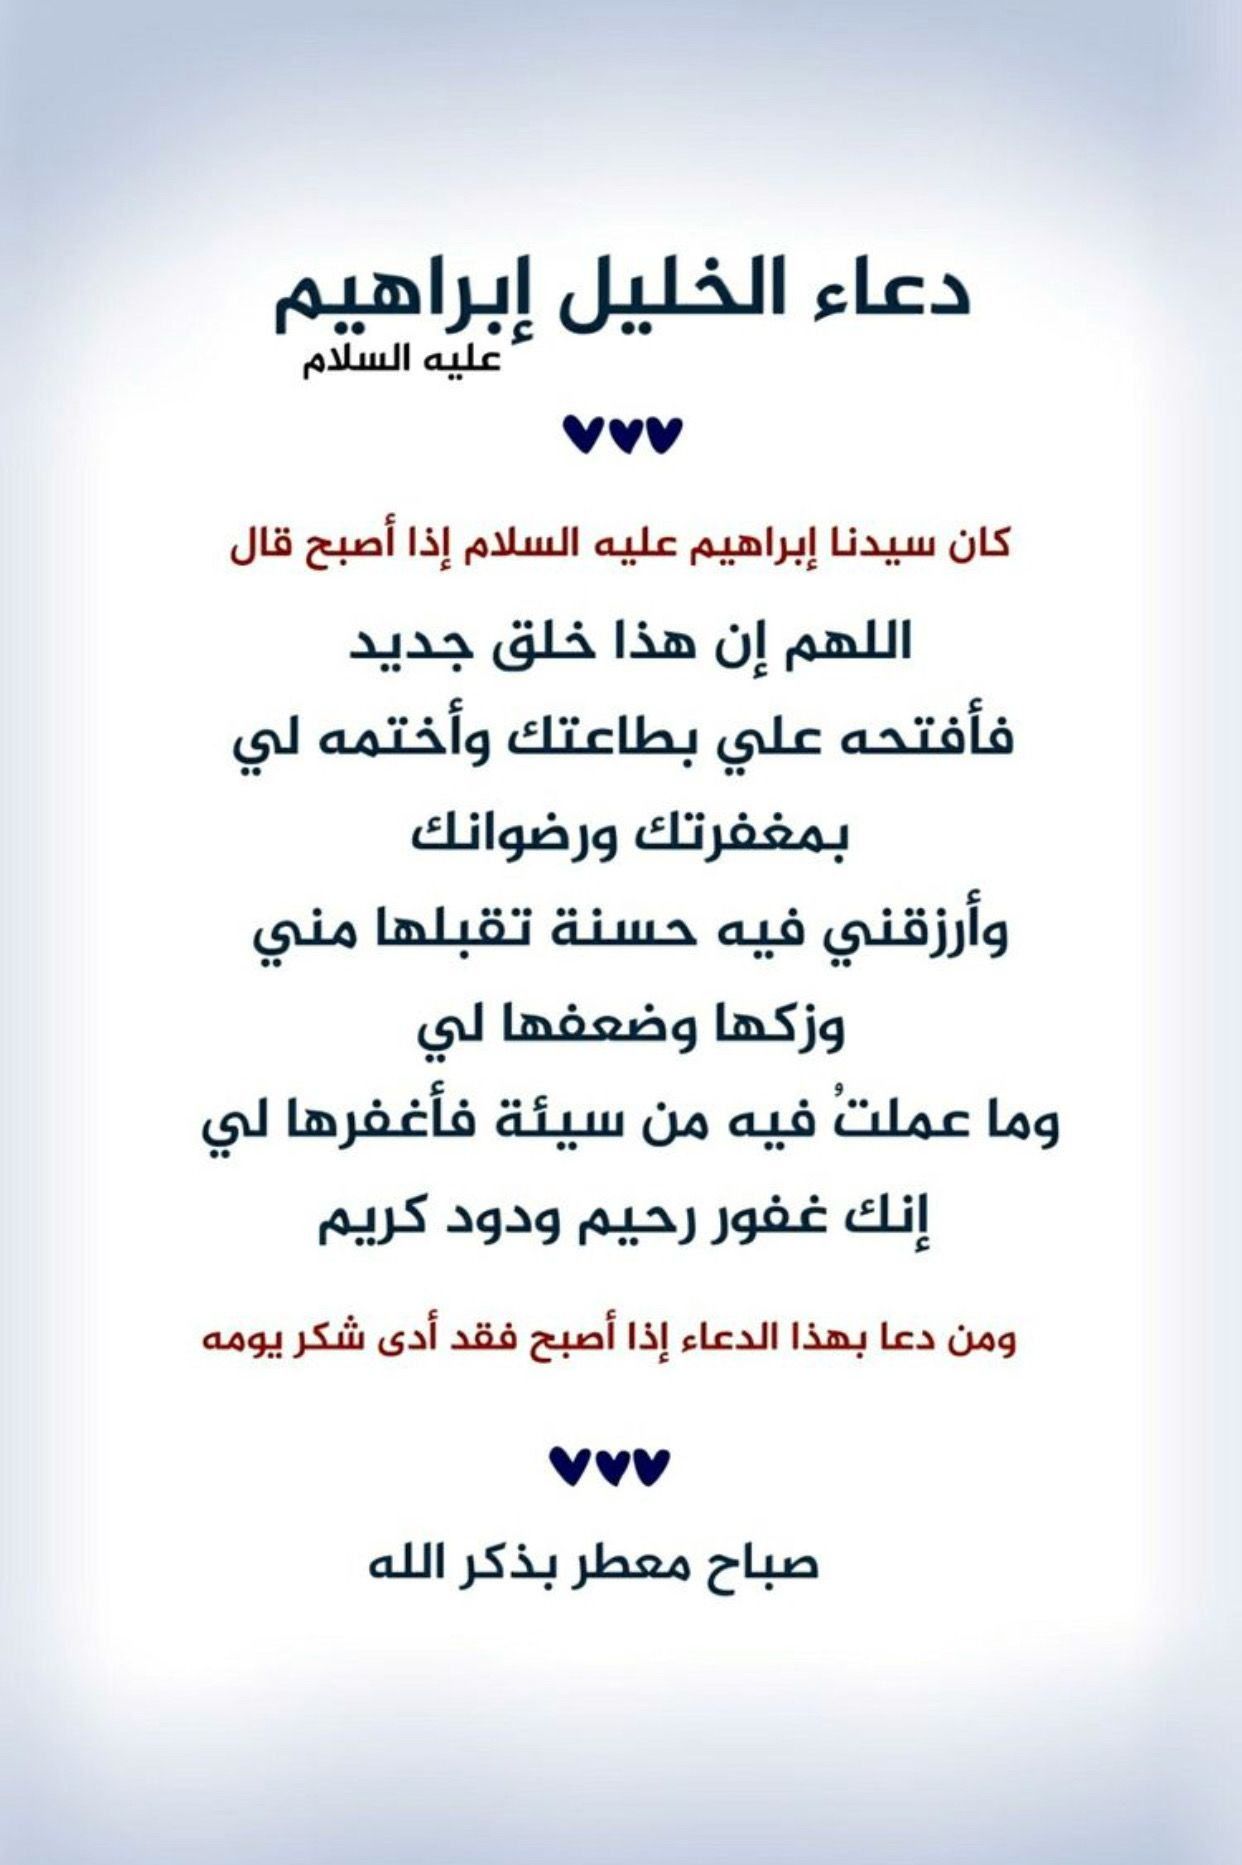 Pin By Sayarimanoubi On اذكارات Quran Quotes Islamic Quotes Islam Quran